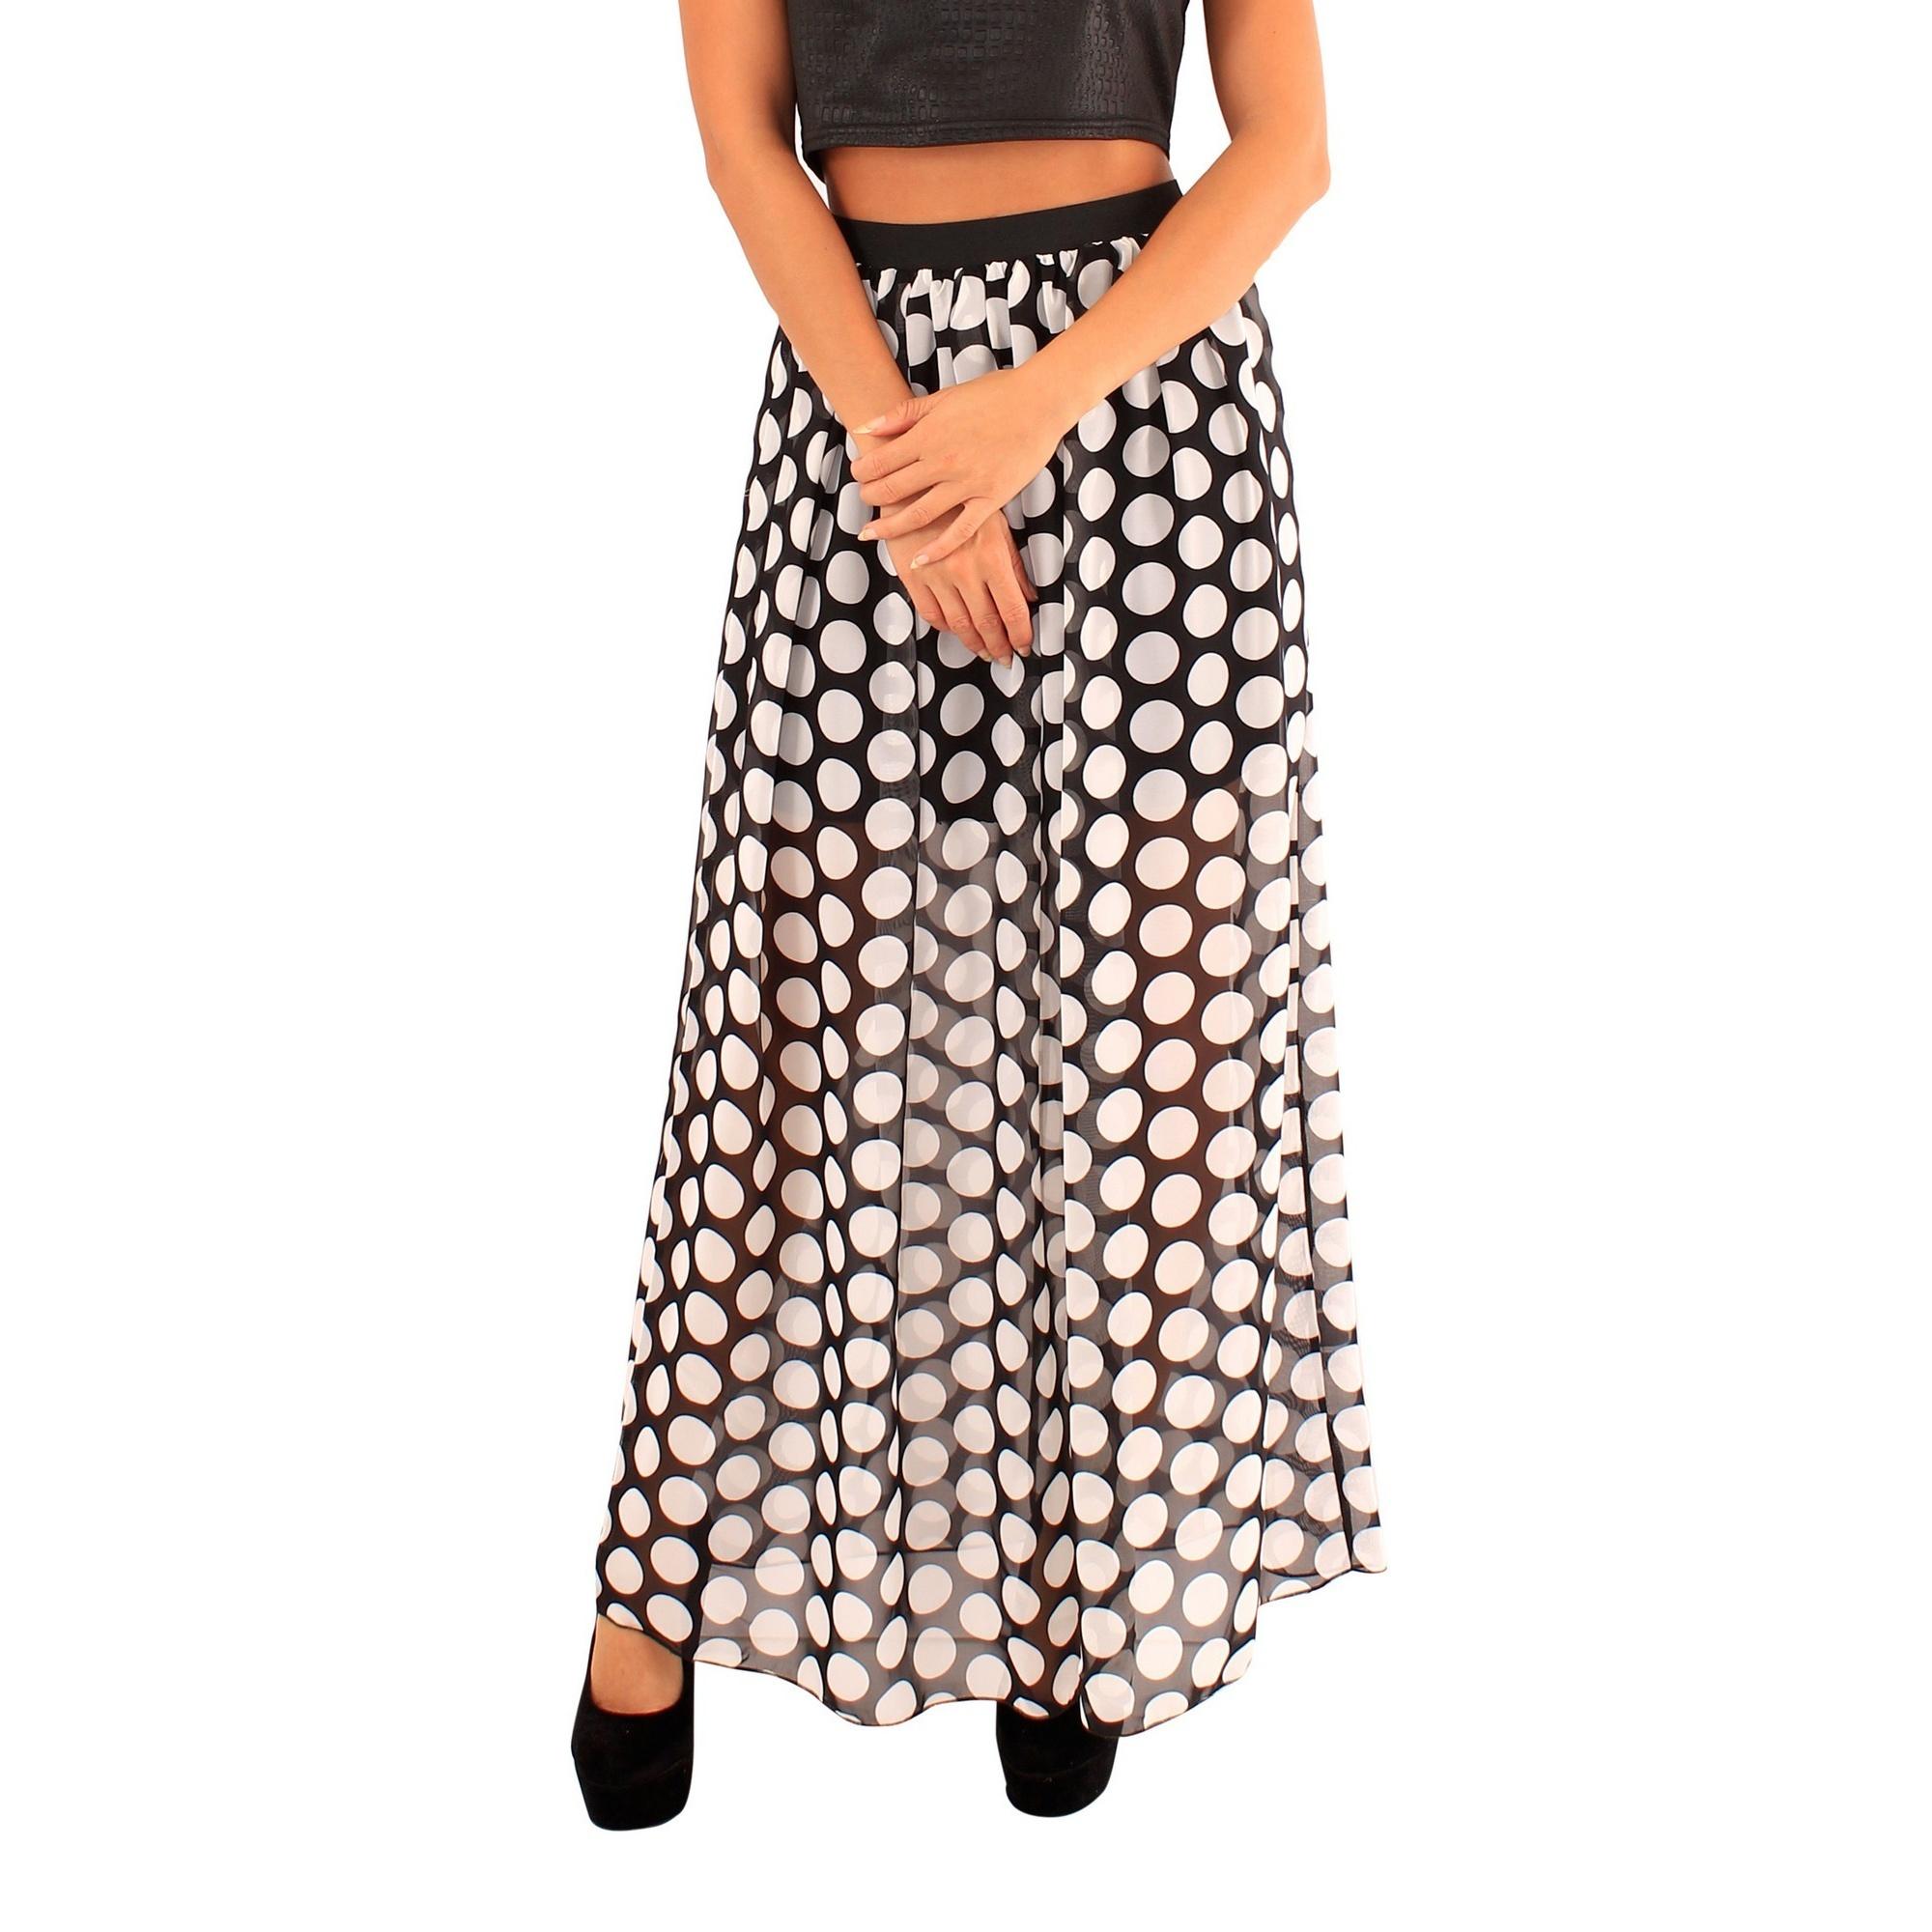 Lili London Womens/Ladies Mandy Polka Dot Maxi Skirt (S/M) (Black)